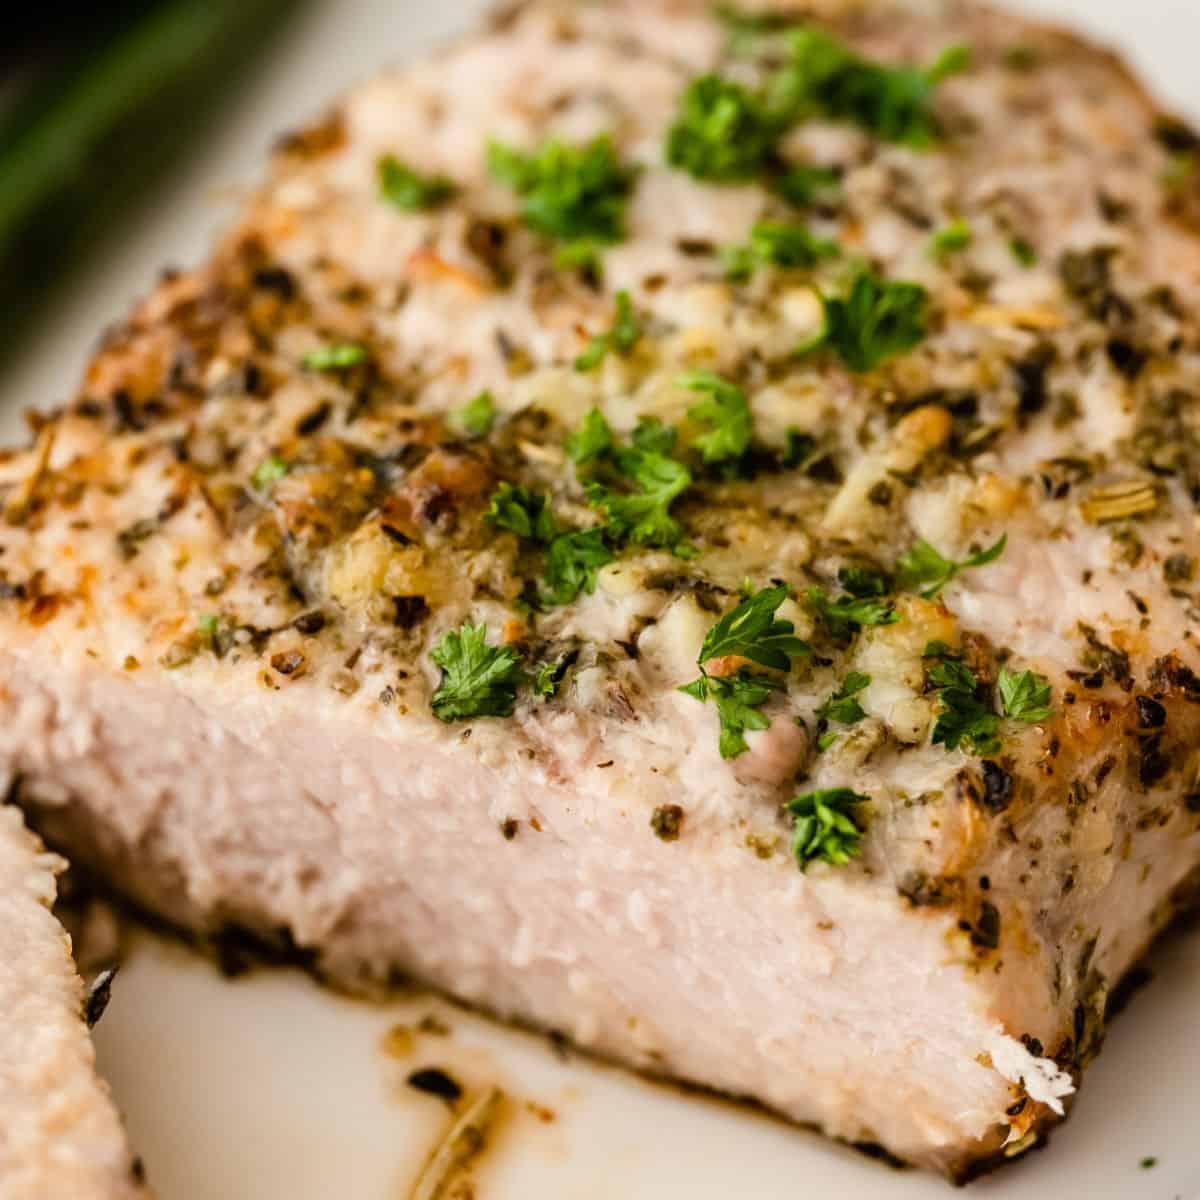 square close up of an air fryer pork chop cut in half